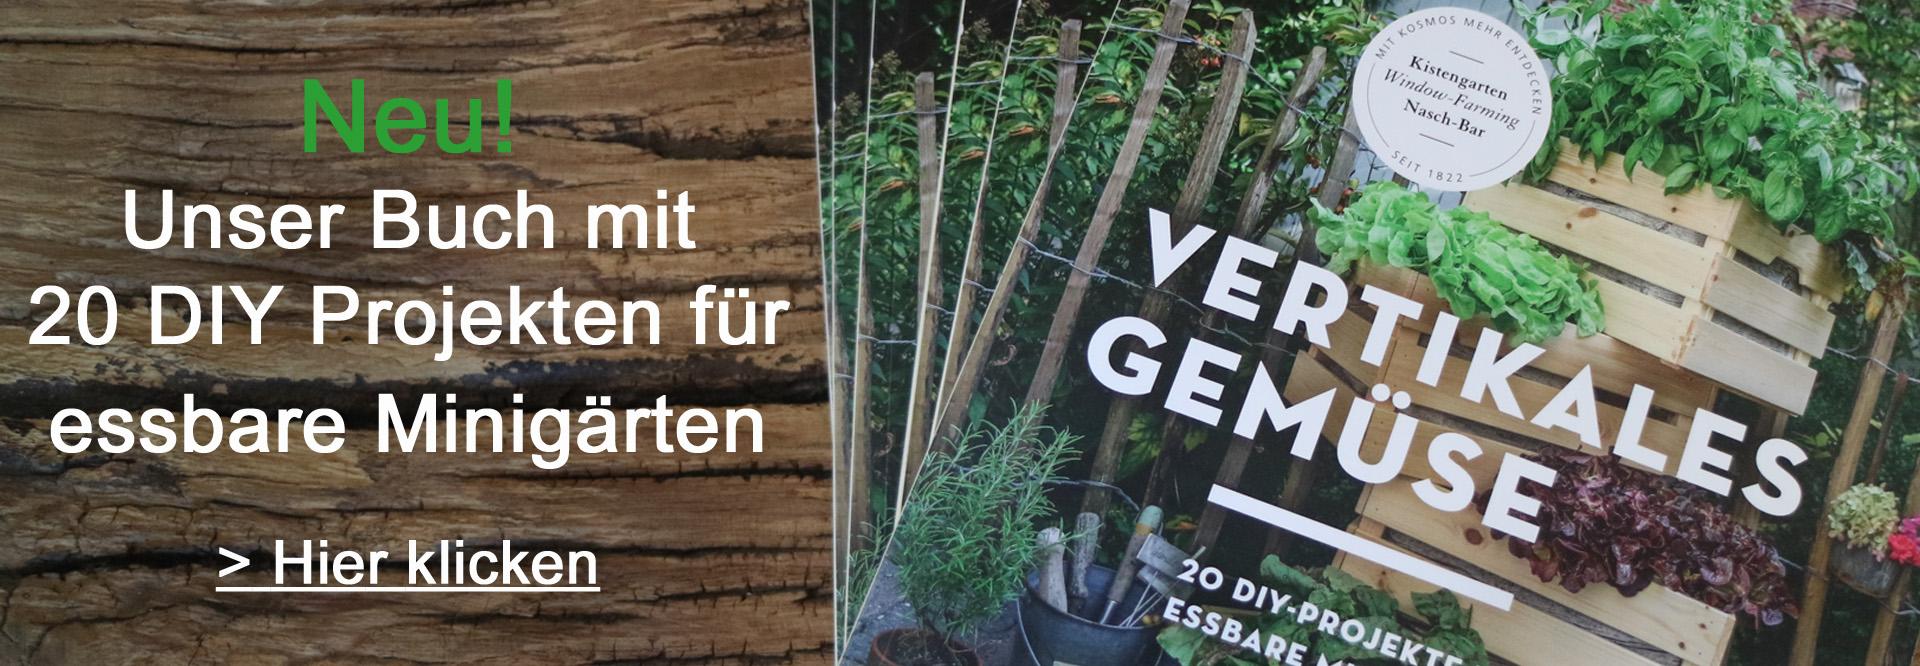 Vertikales Gemüse Buch